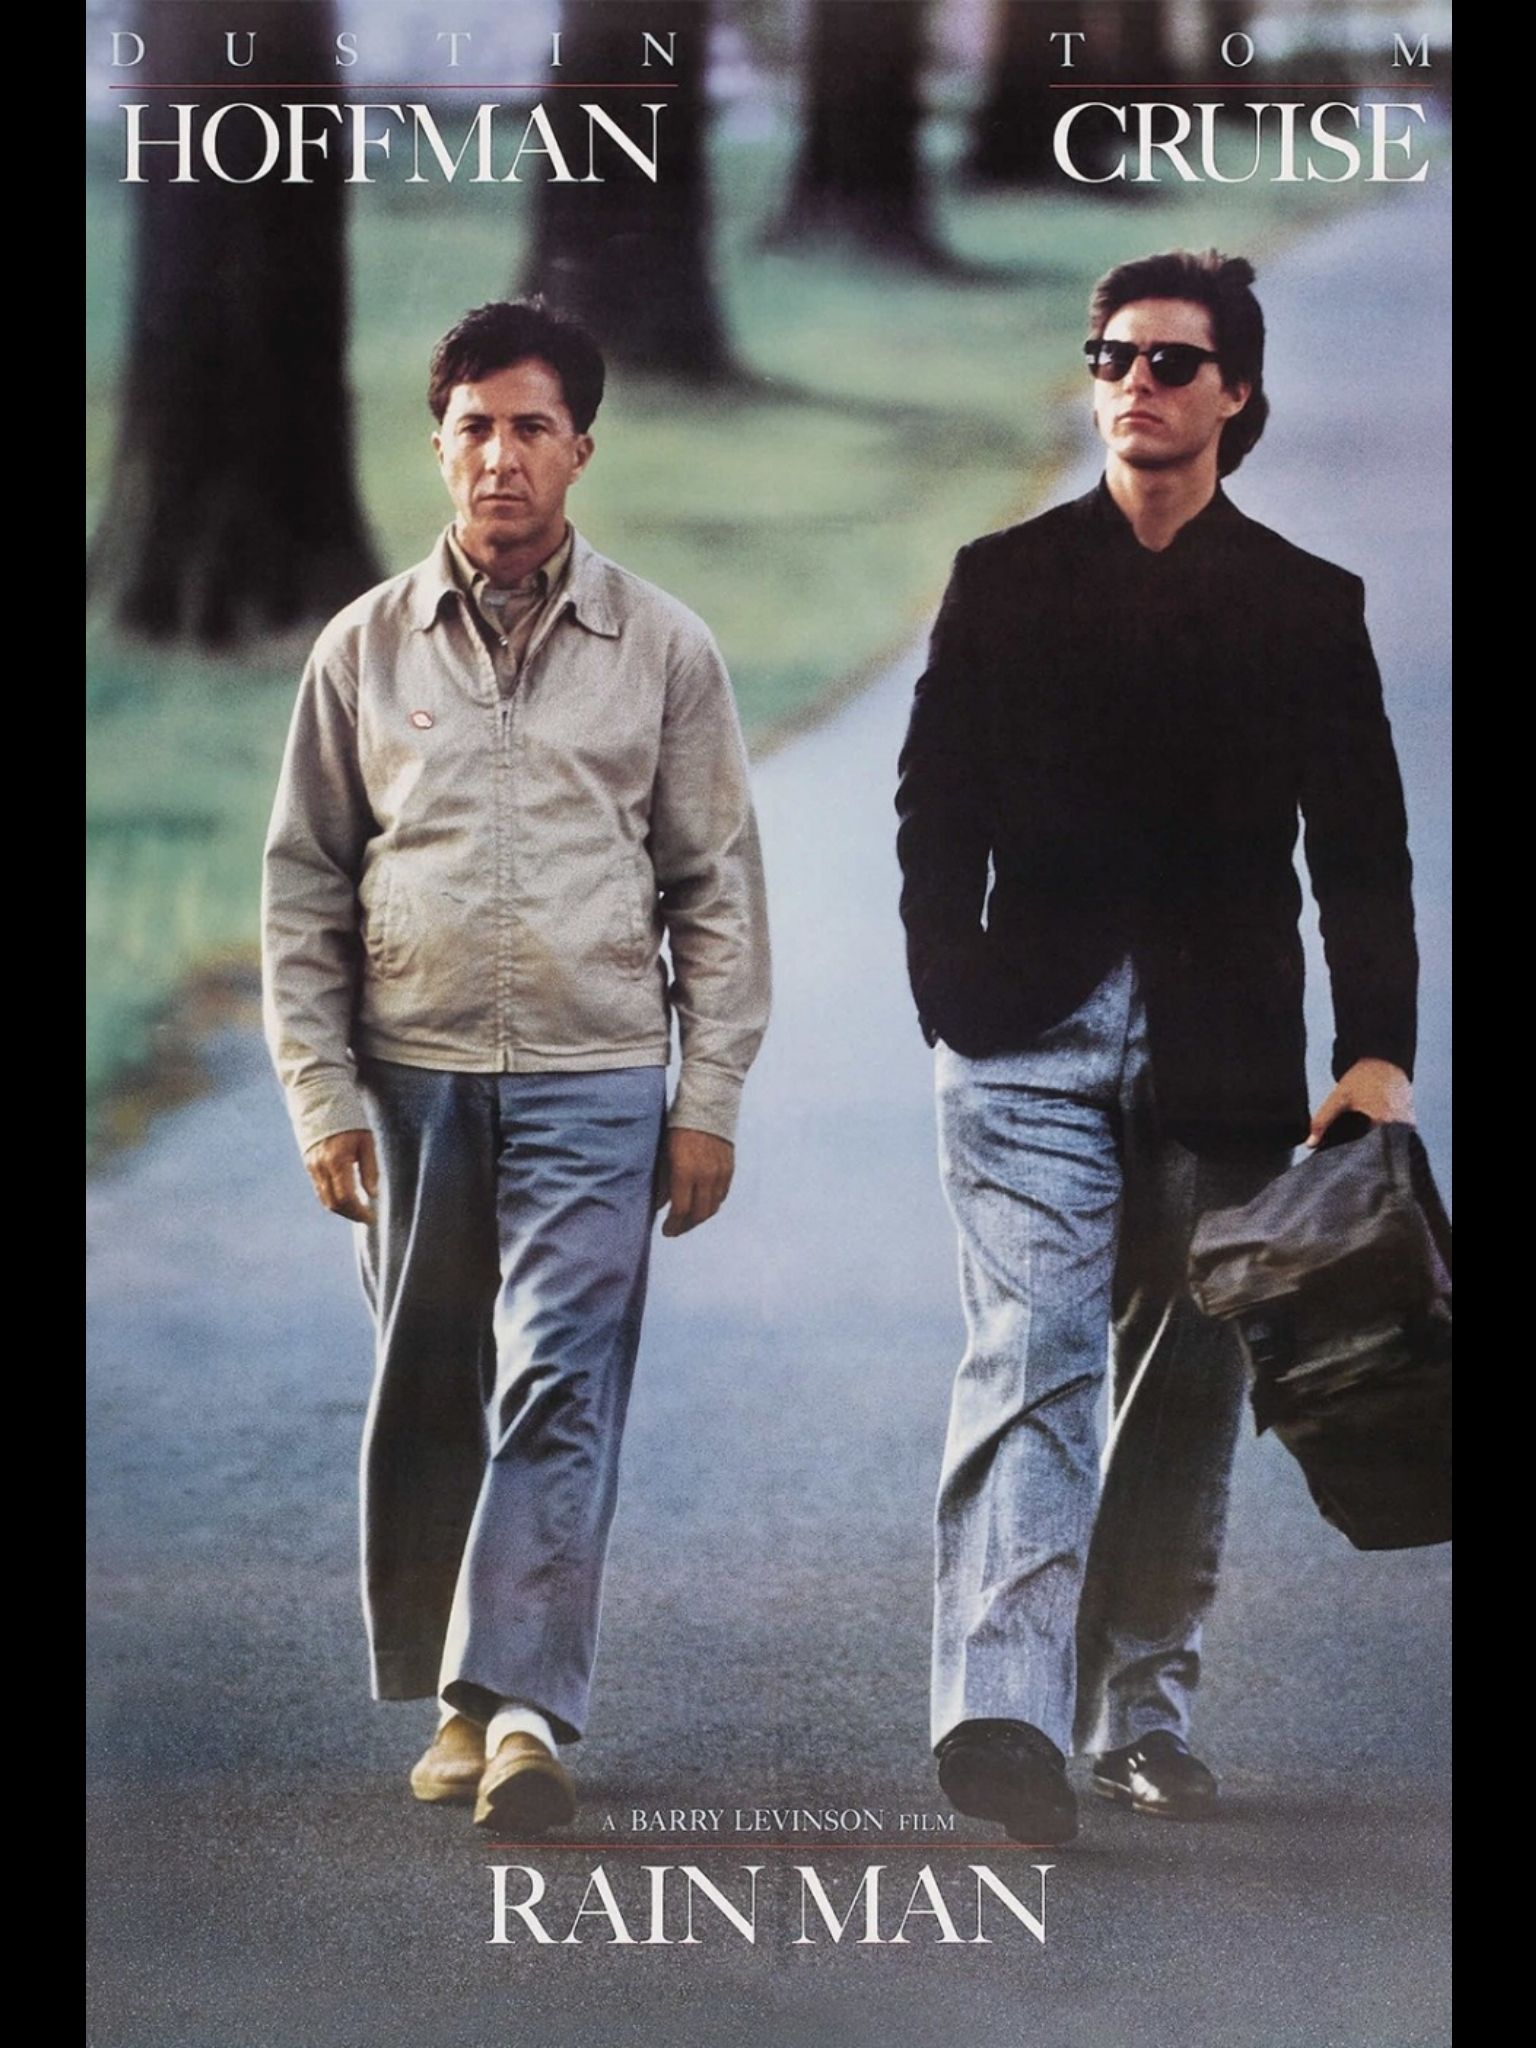 Rain Man 1988 A Film By Barry Levinson Movies Dustin Hoffman Tom Cruise Valeria Golino Gerald R Molen Jack Mur Man Movies Movies Internet Movies